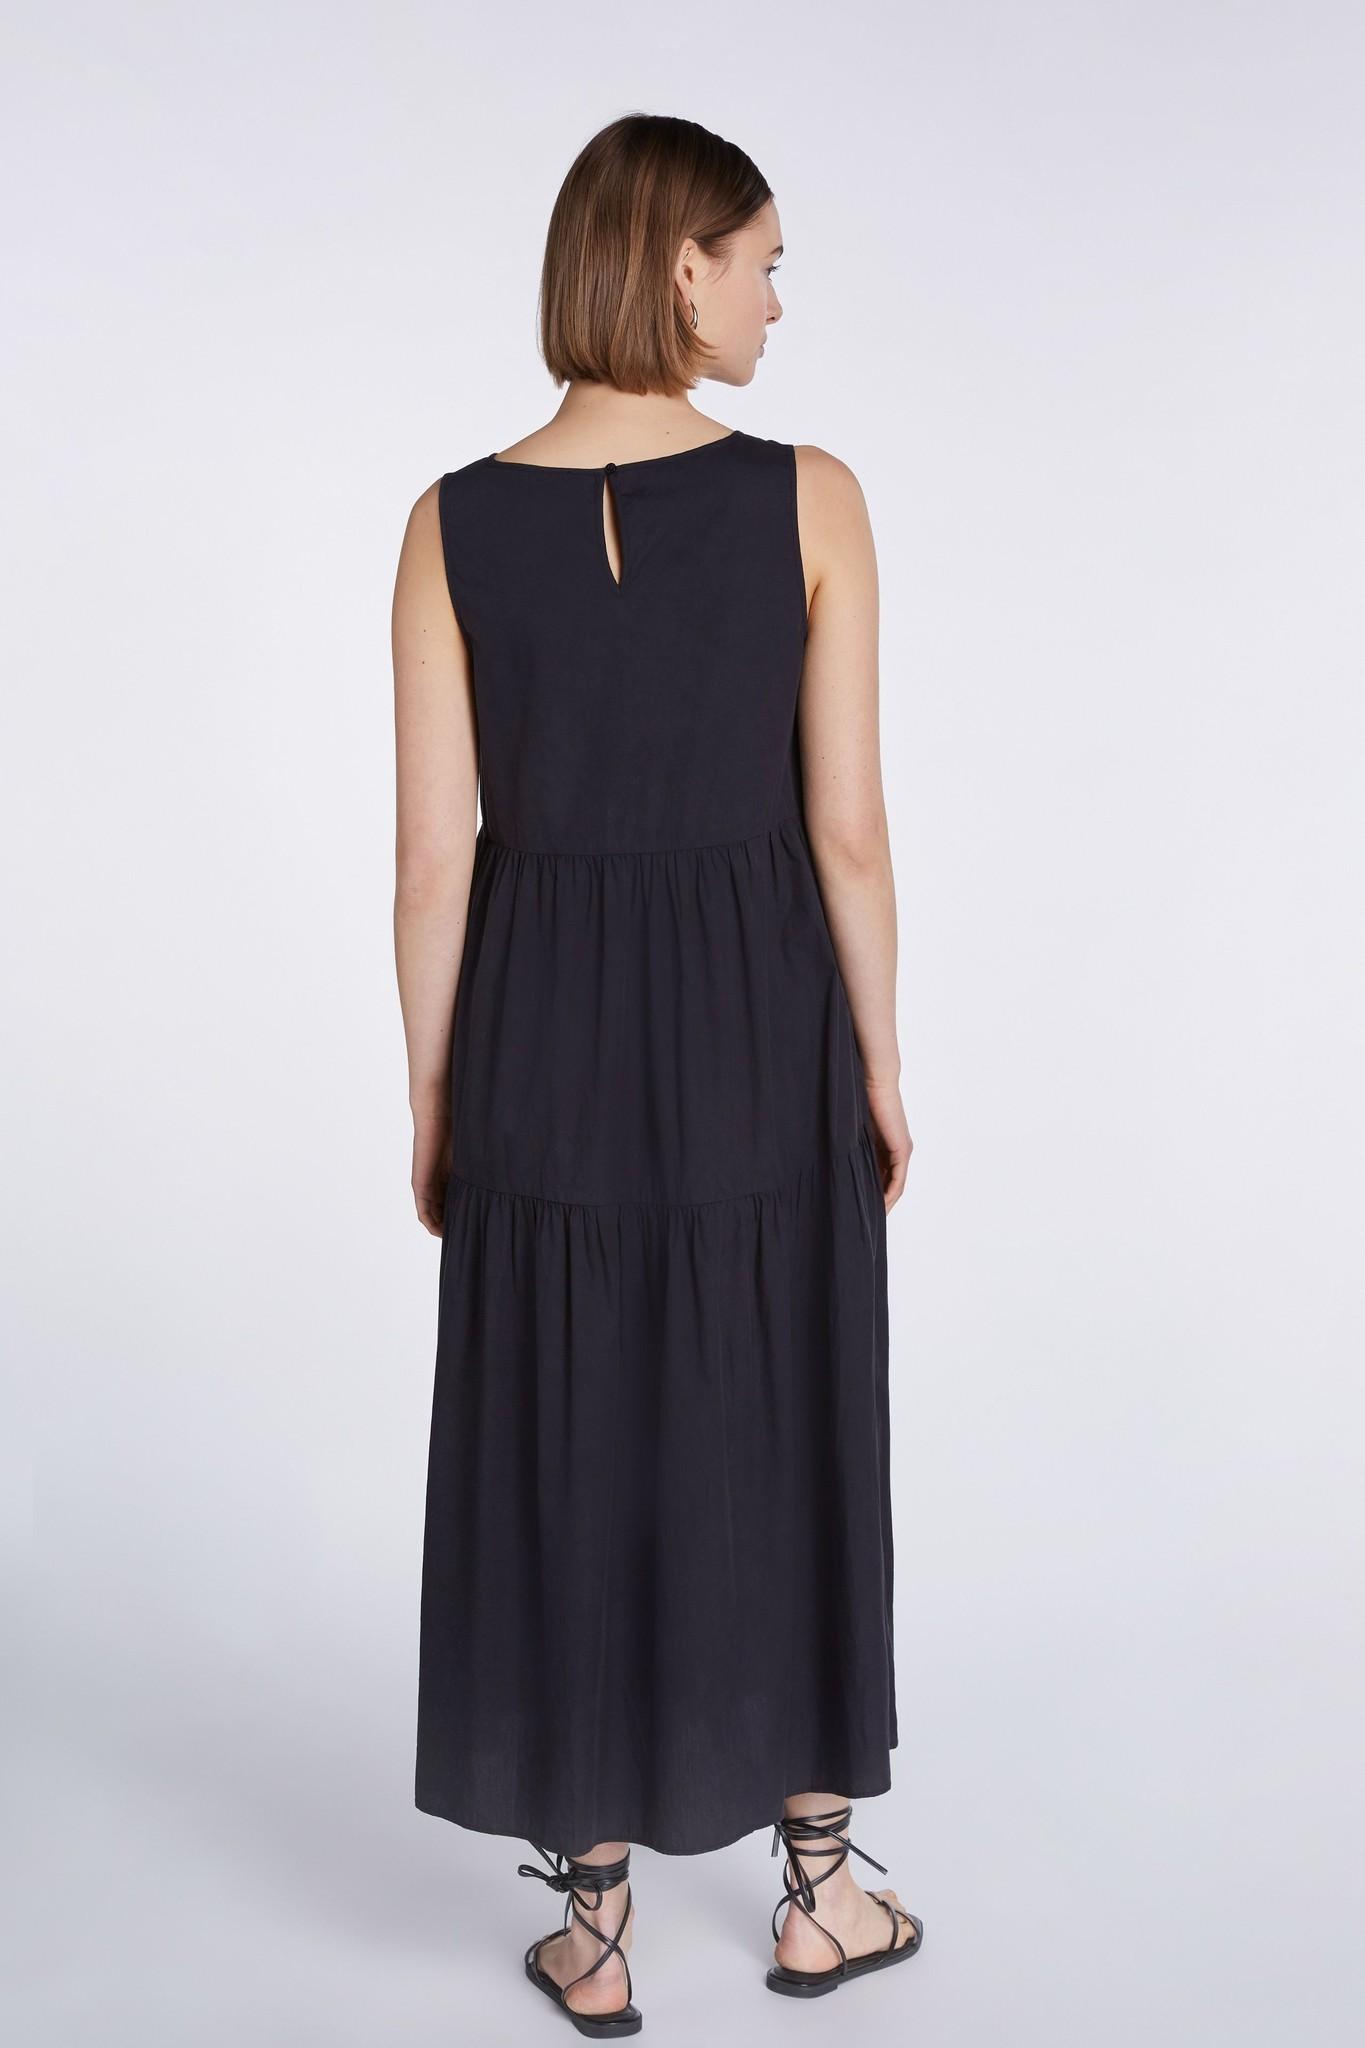 SET dress 721905110403-2